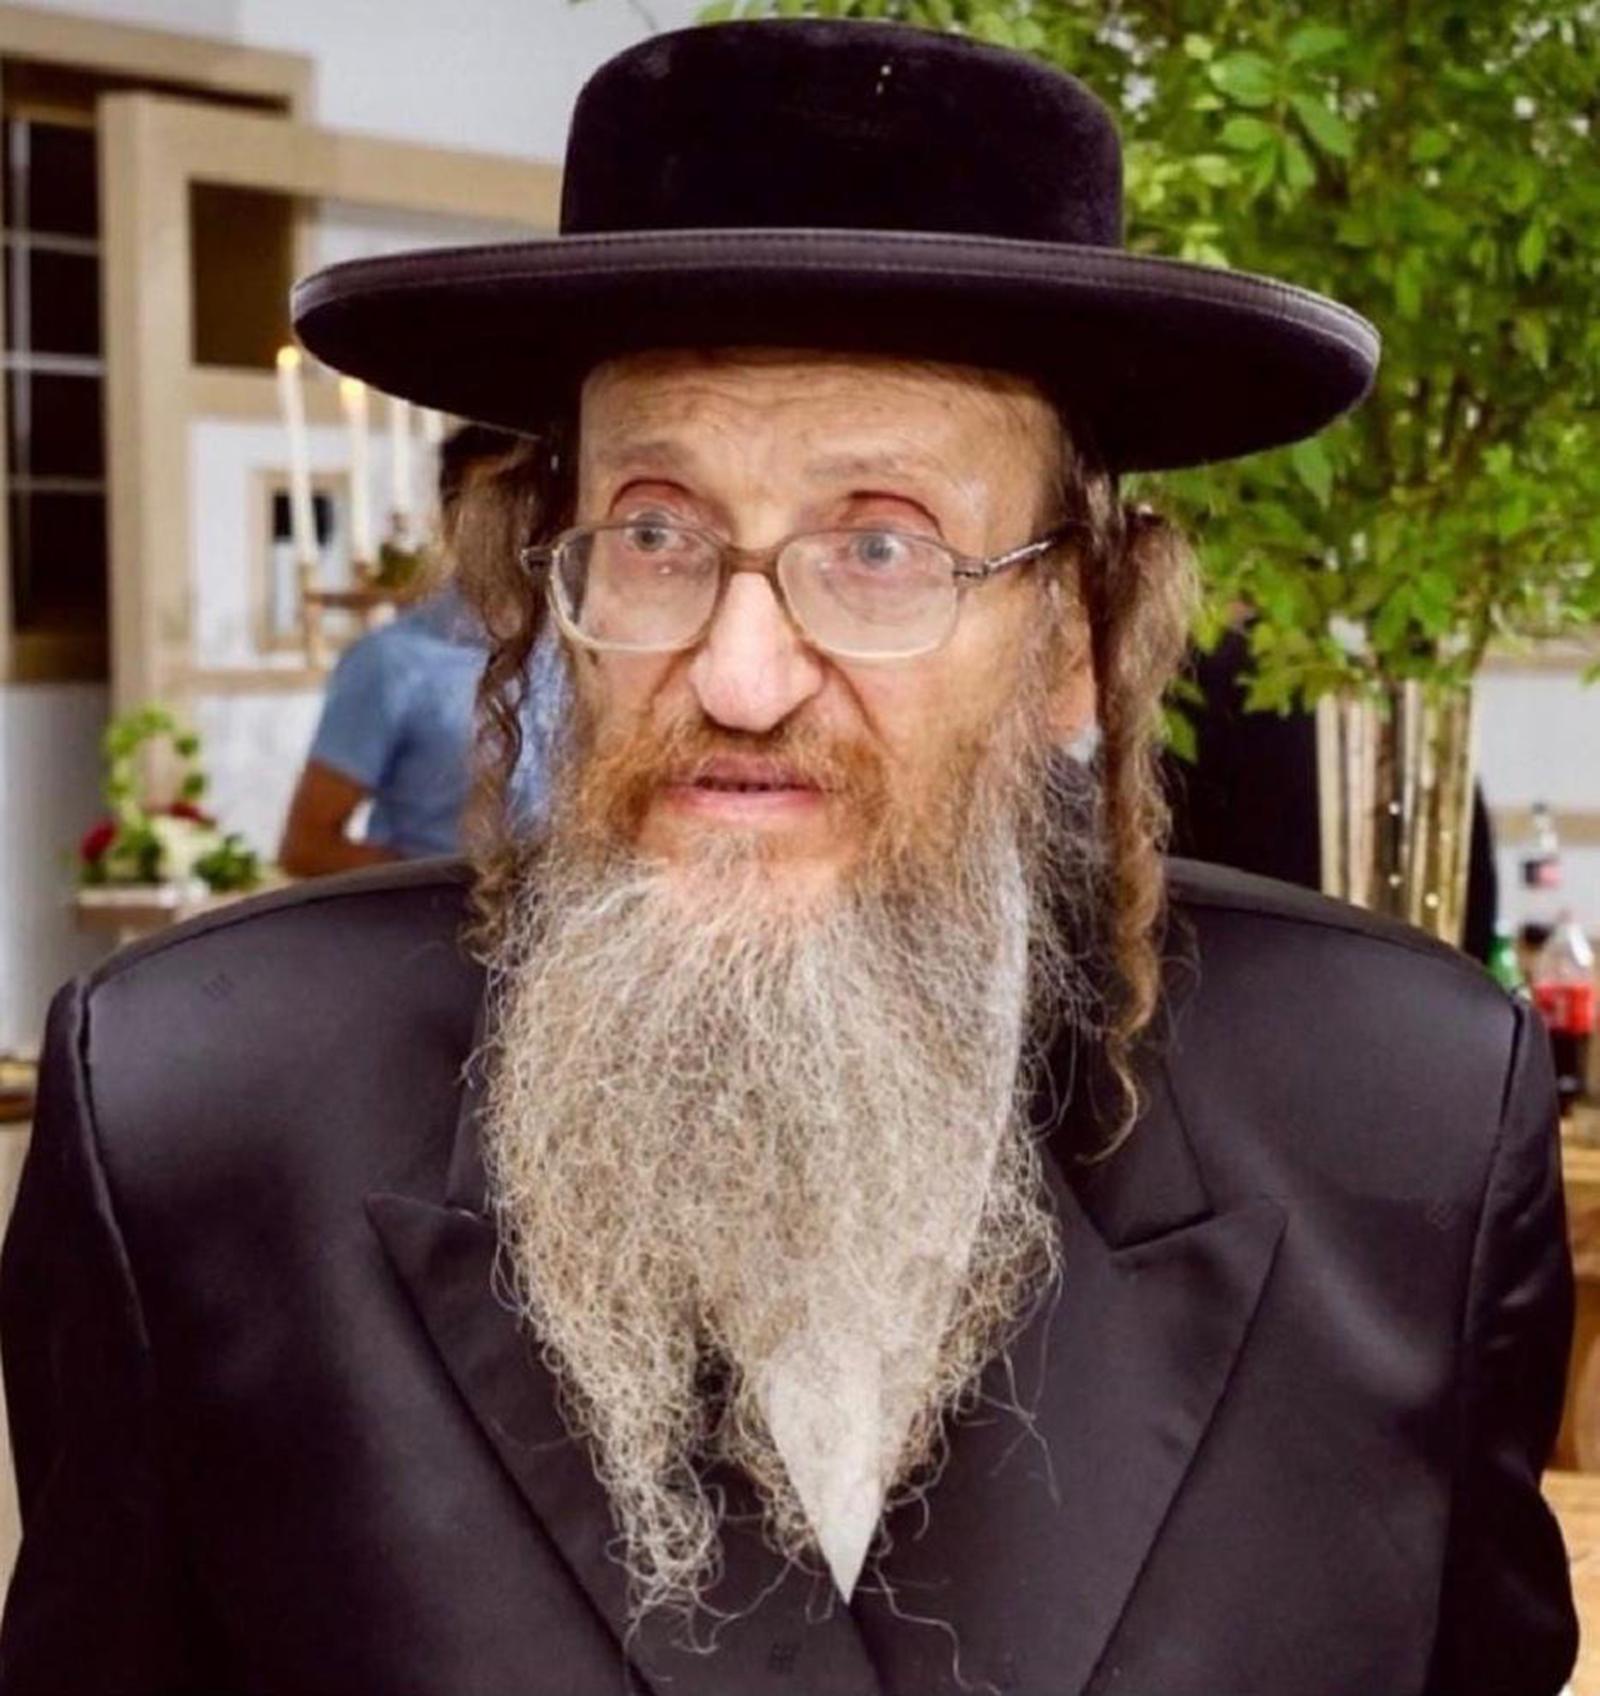 Stabbing victim dies 3 months after attack at Hanukkah celebration in New York